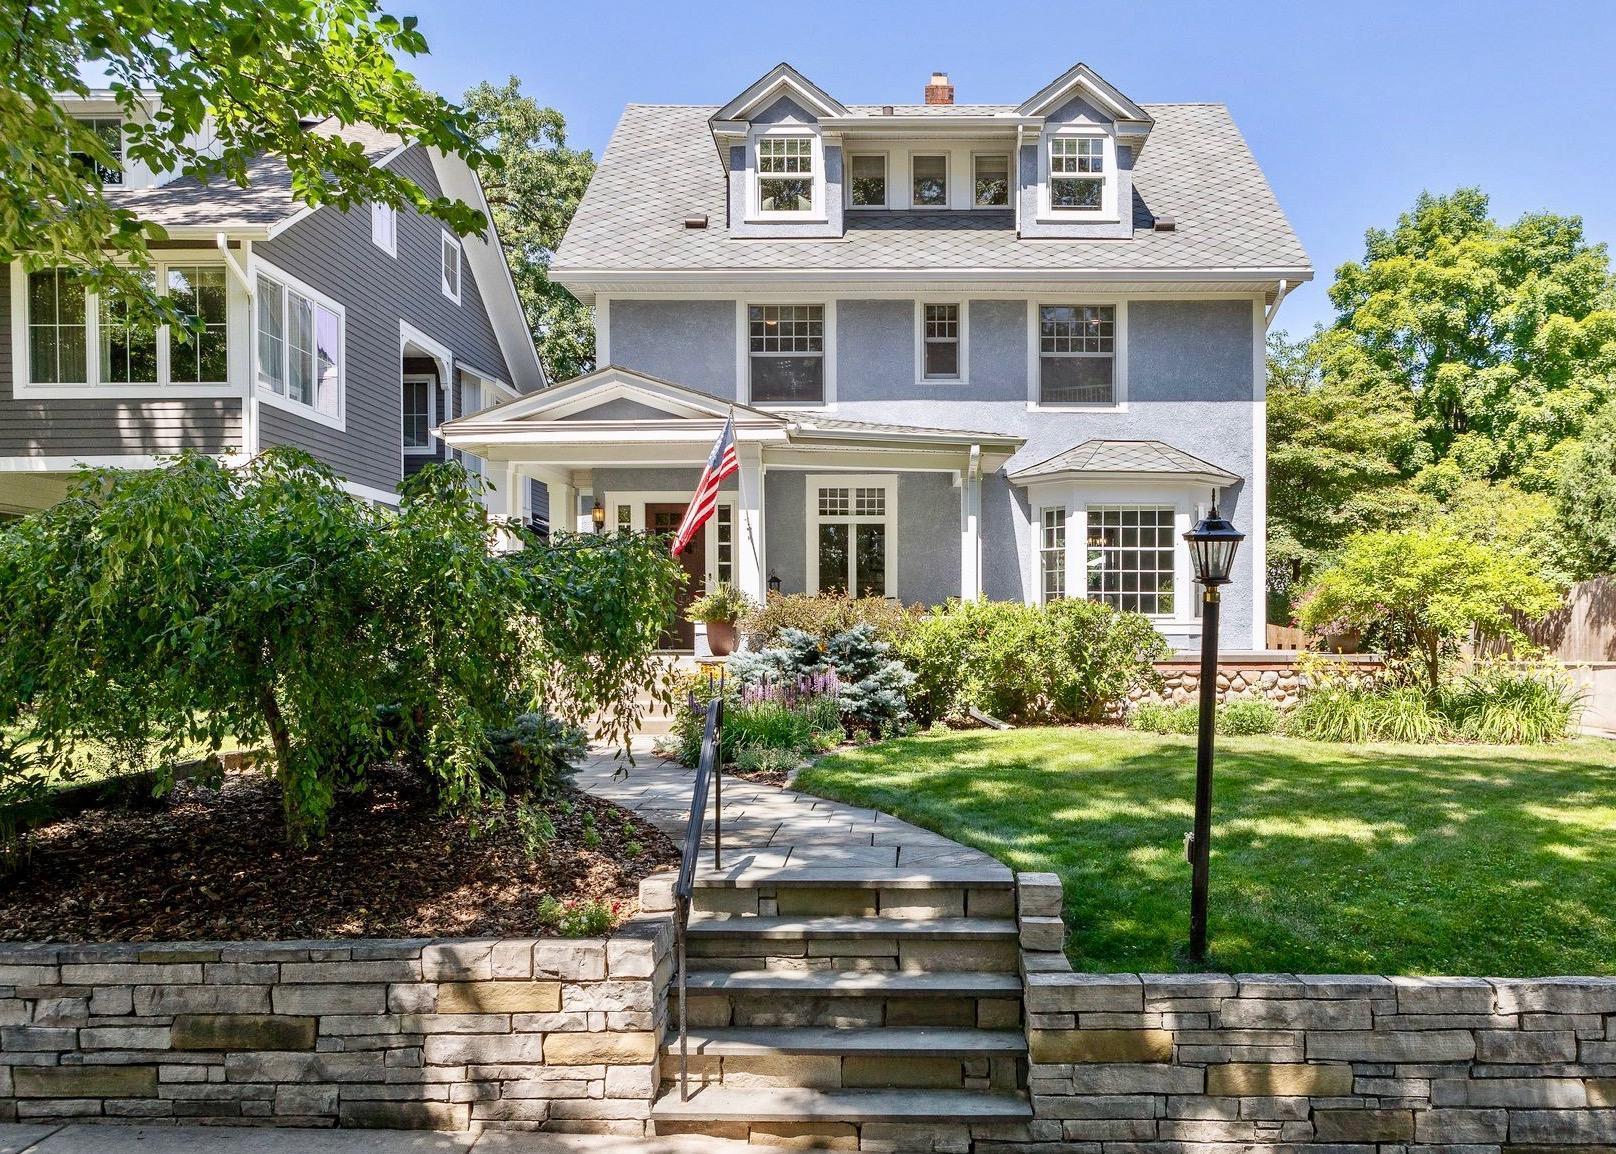 2408 W 24th Street Property Photo - Minneapolis, MN real estate listing